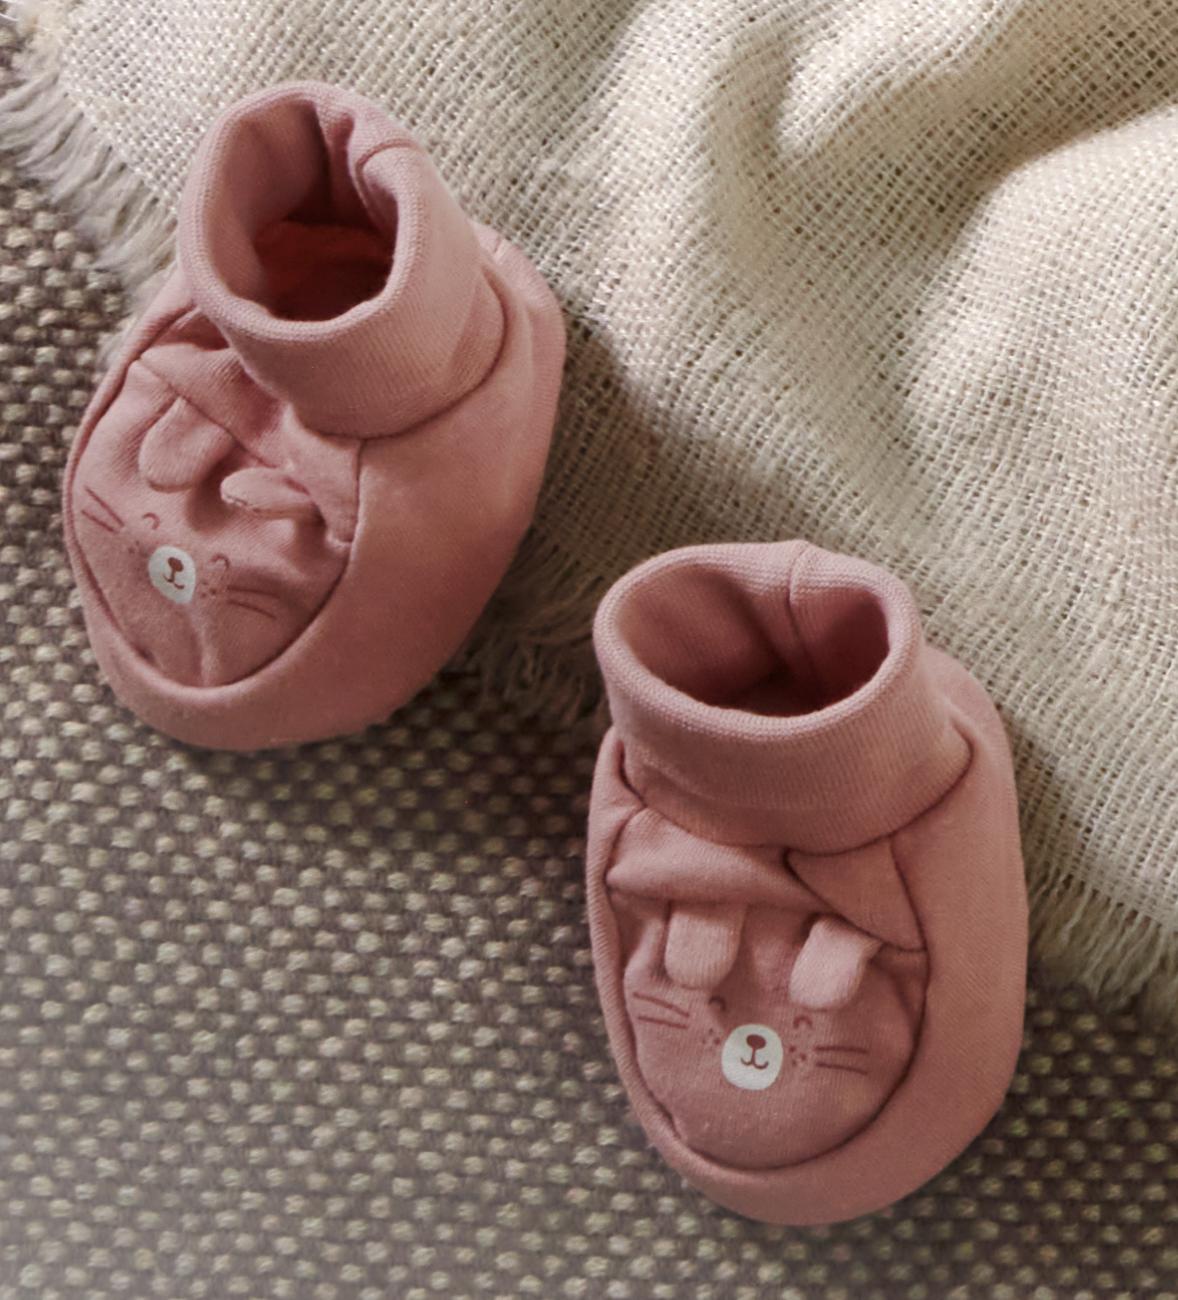 Babyschuhe im Eisbär-Motiv